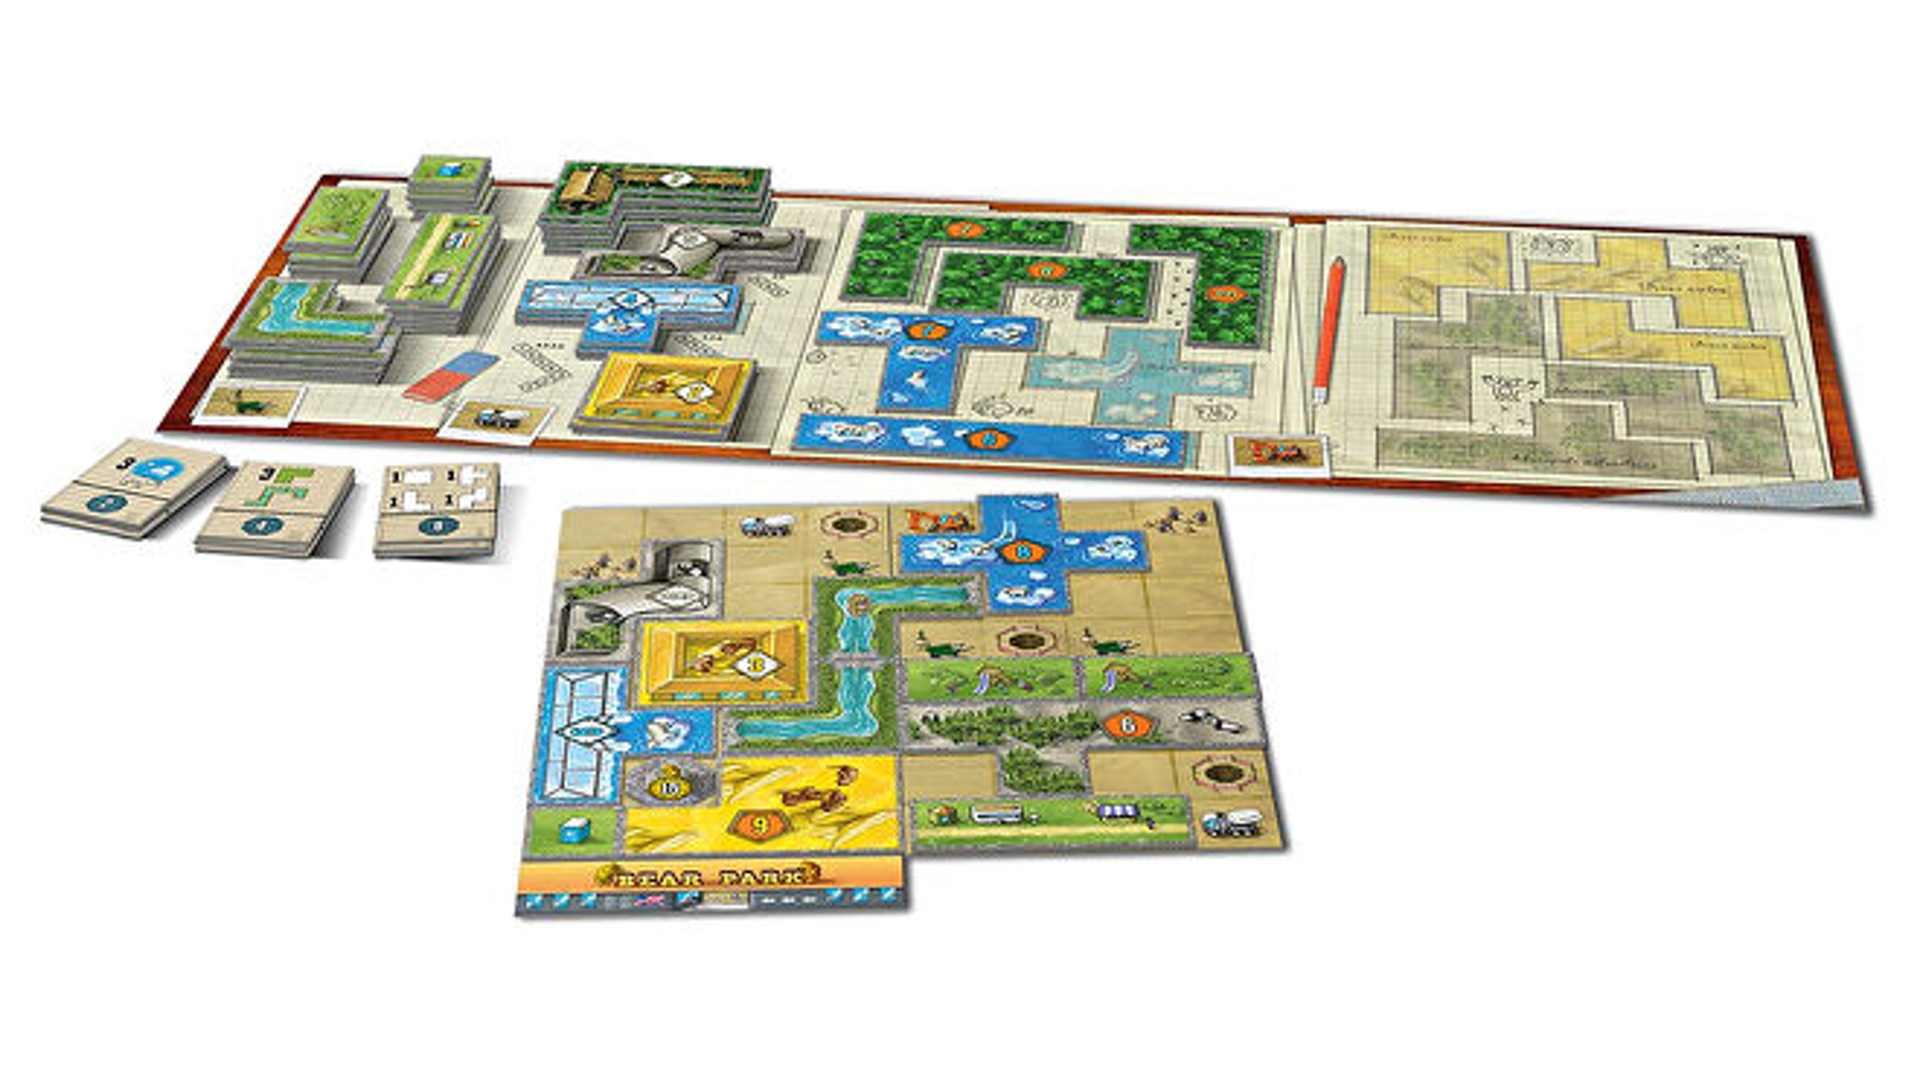 Barenpark beginner board game gameplay layout